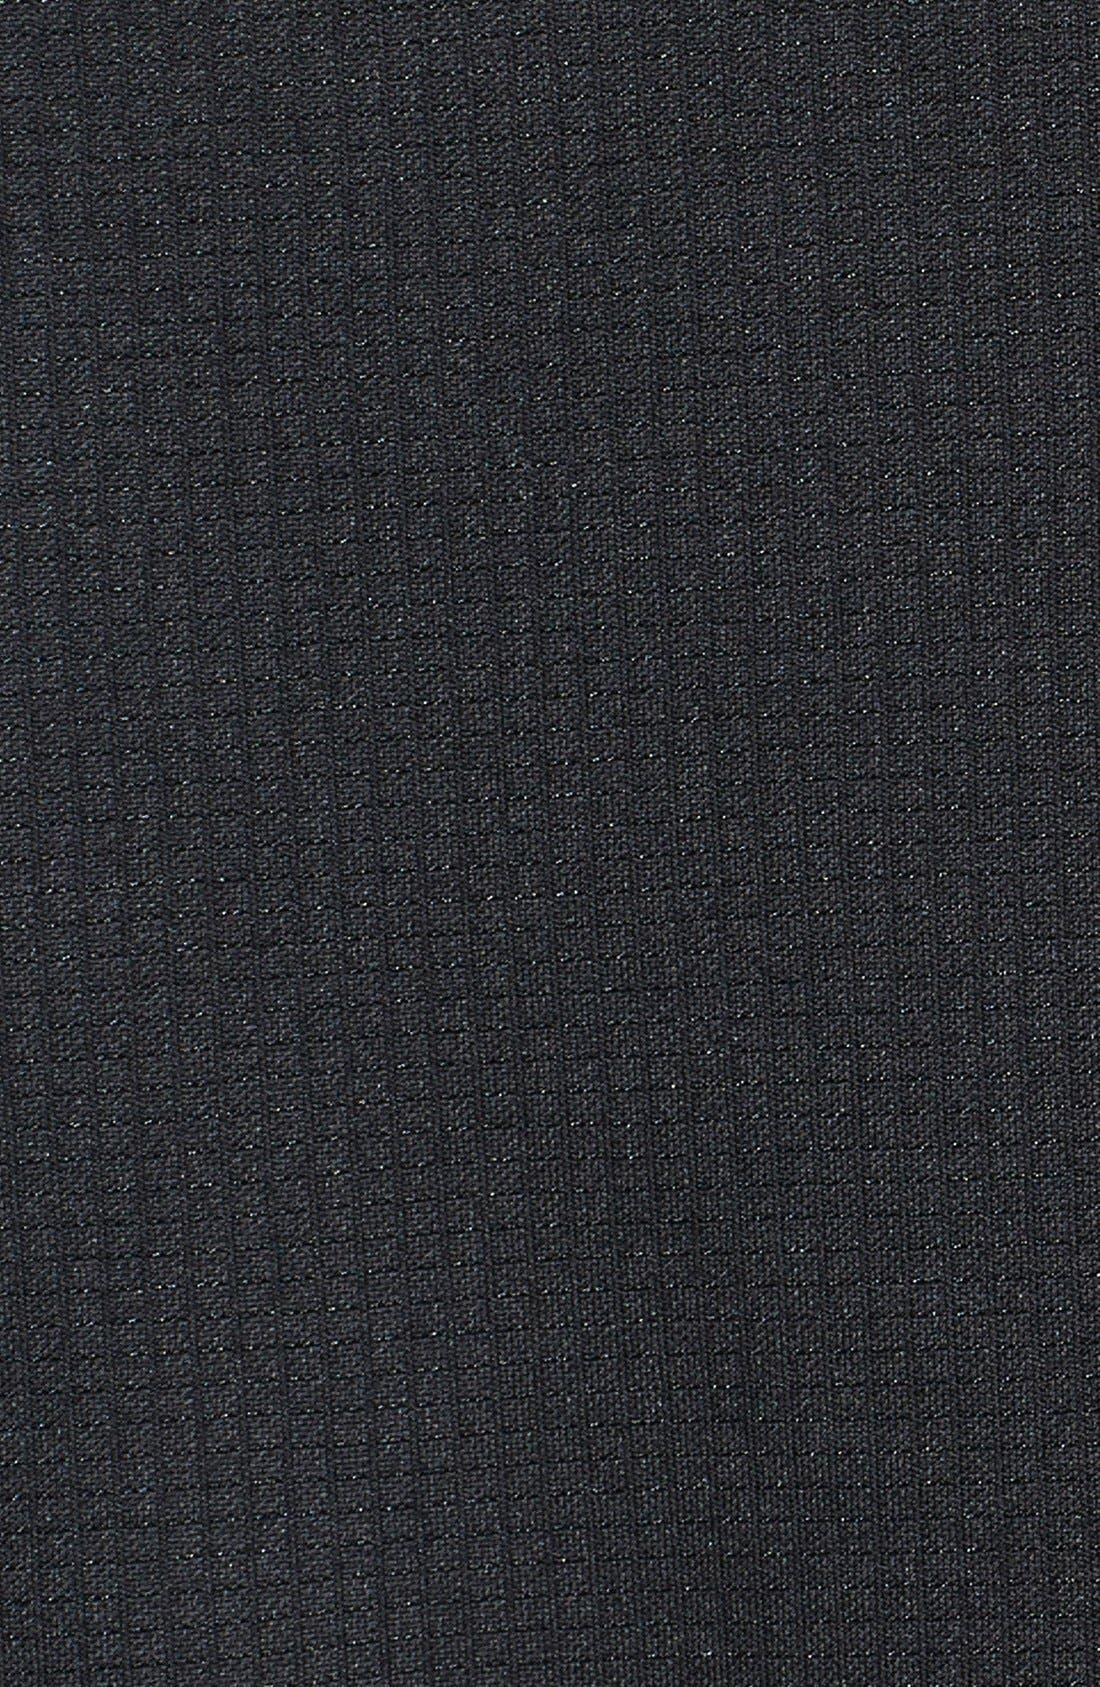 'New Orleans Saints - Genre' DryTec Moisture Wicking Polo,                             Alternate thumbnail 3, color,                             Black